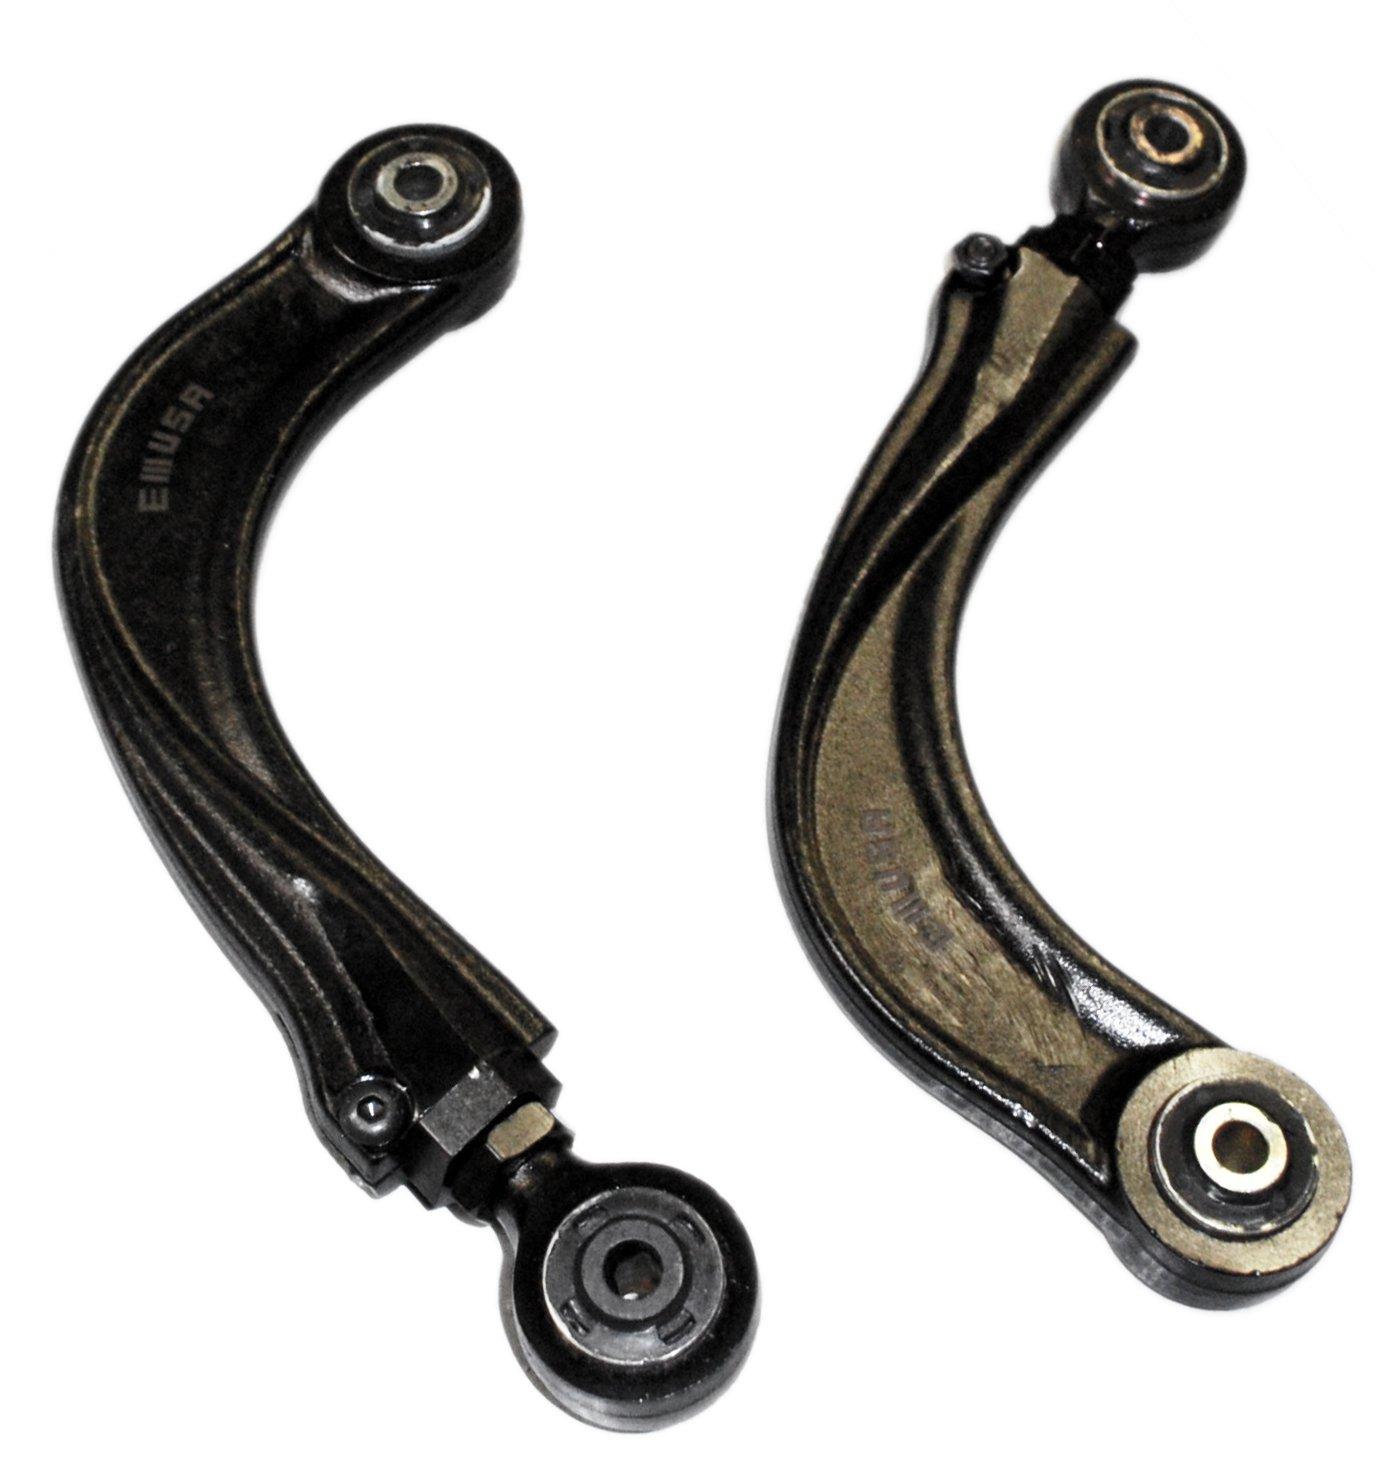 BLACK 04up Mazda 3,06up Mazda 5,00-07 Ford Focus, SVT,04up Volvo S40 V50 Adjustable Rear Camber Kits